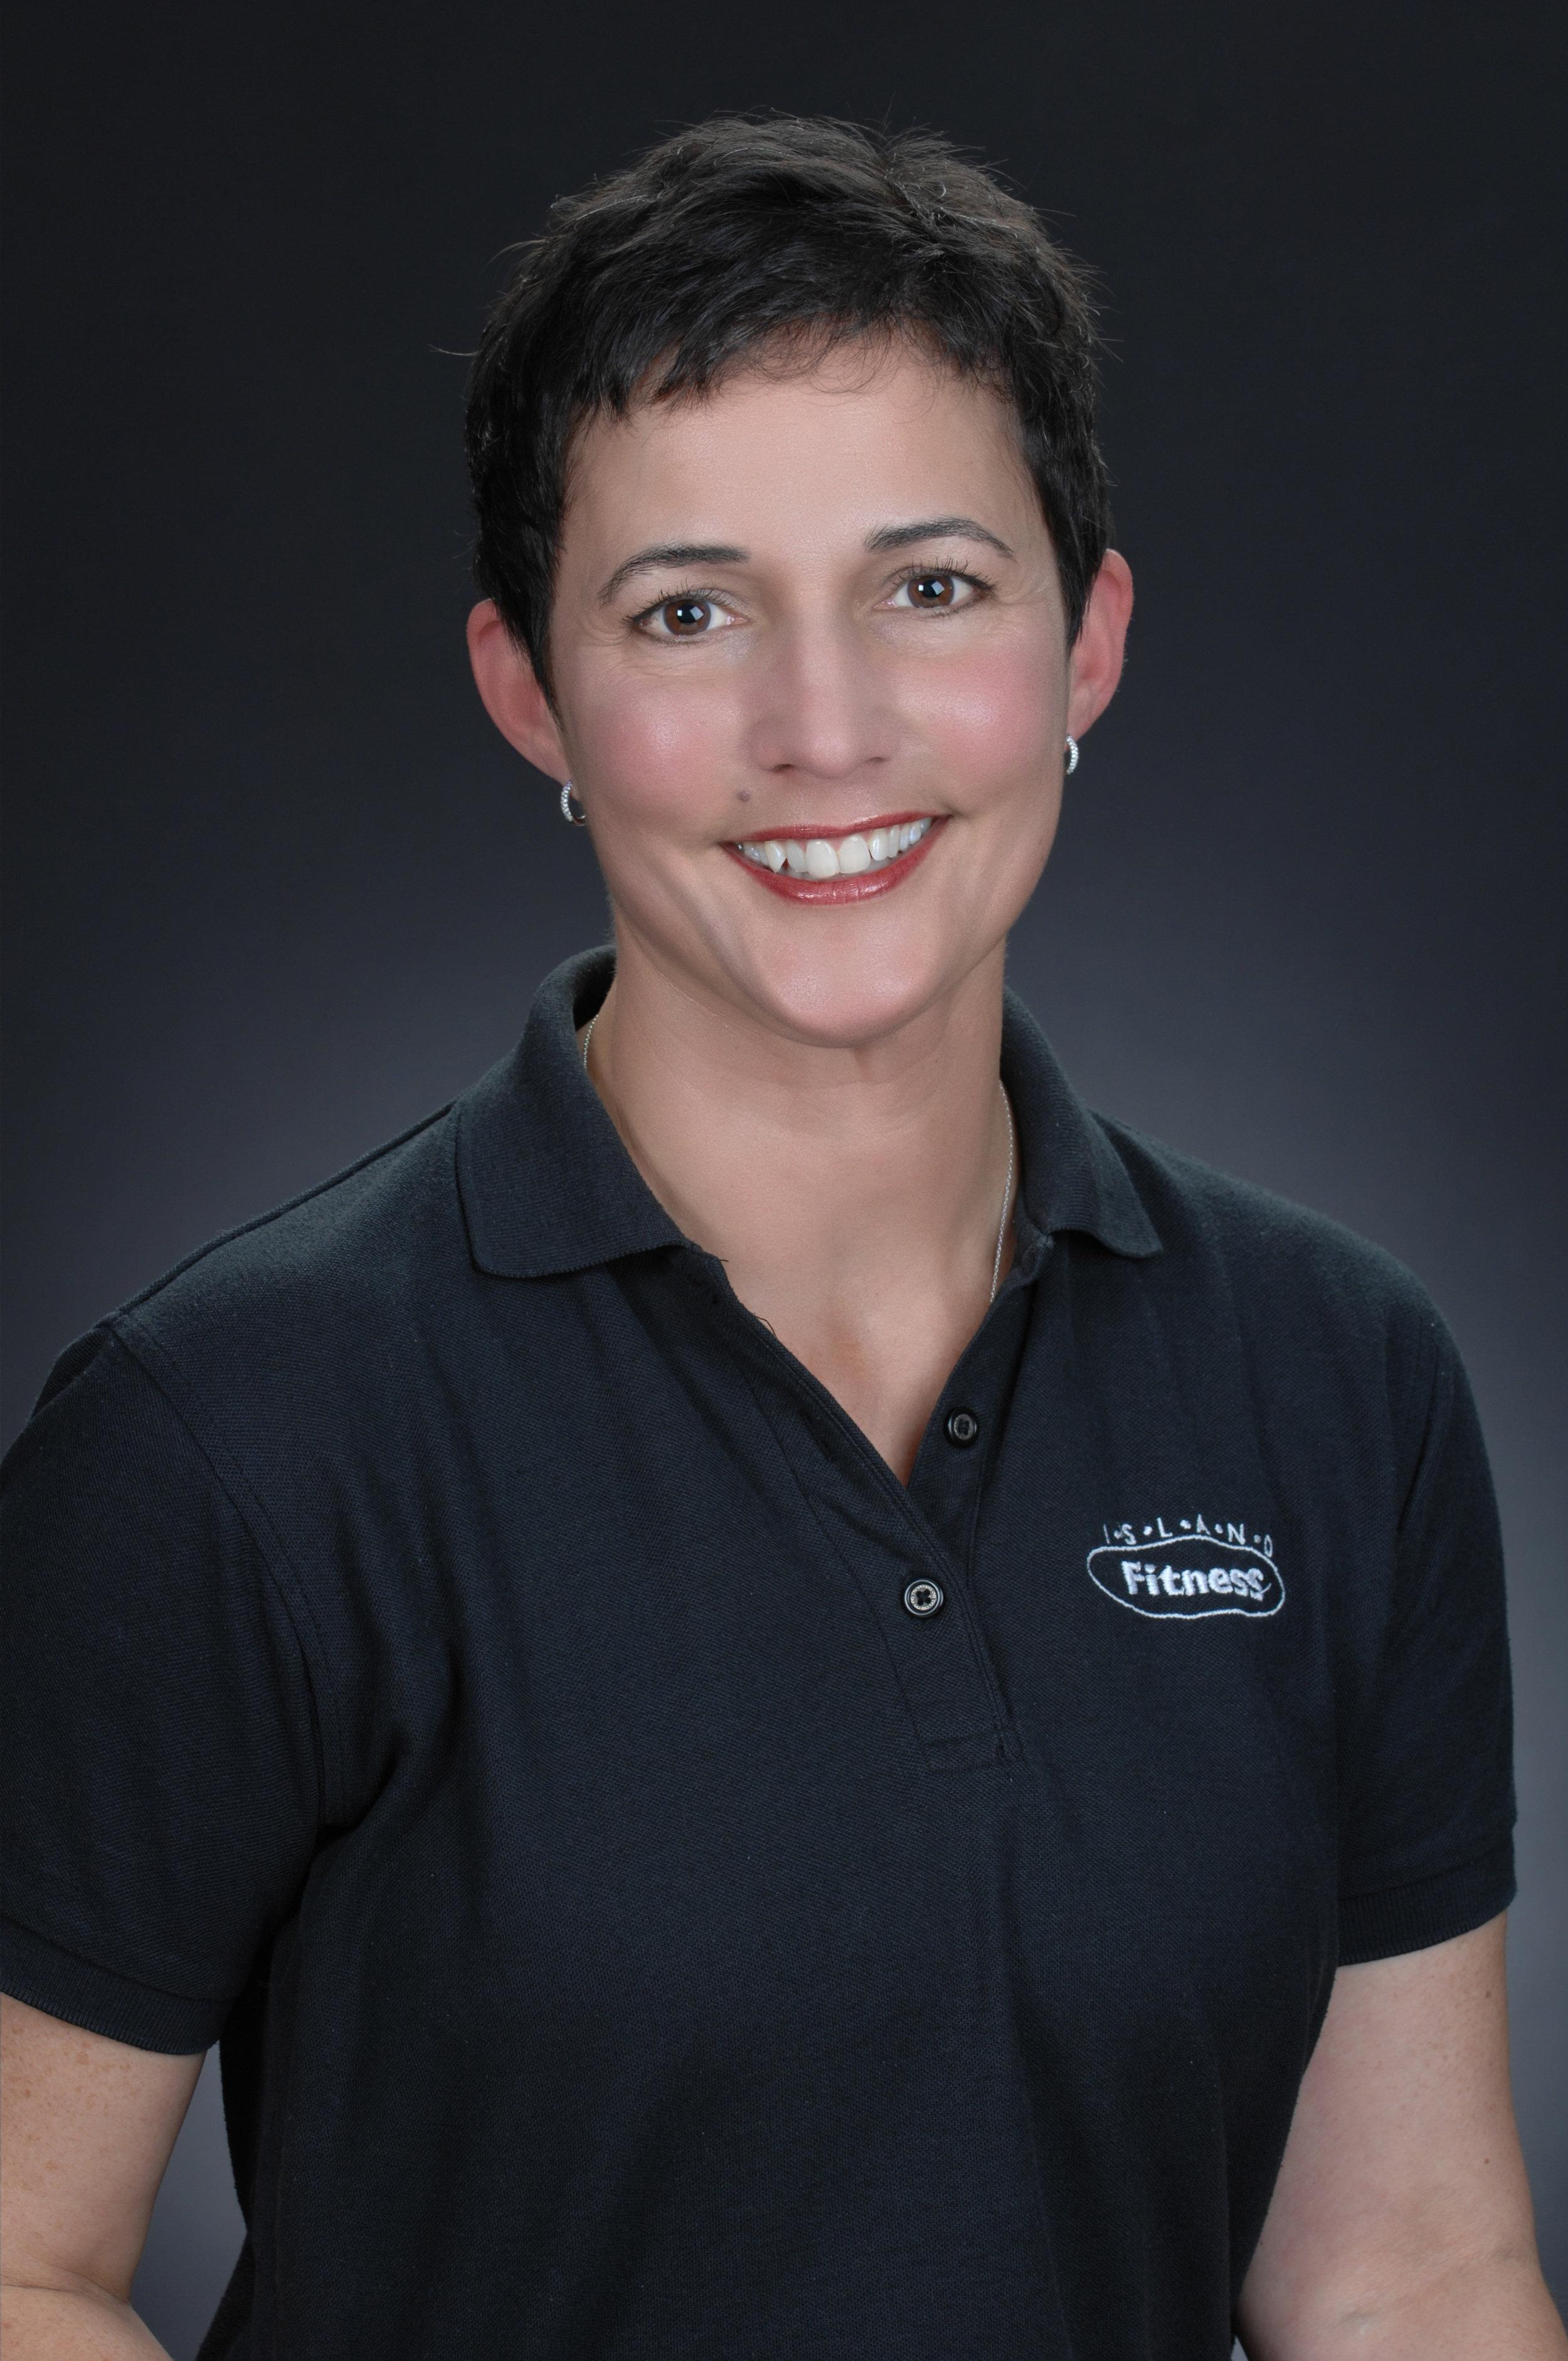 LORETTA STANTON | Specialist Trainer